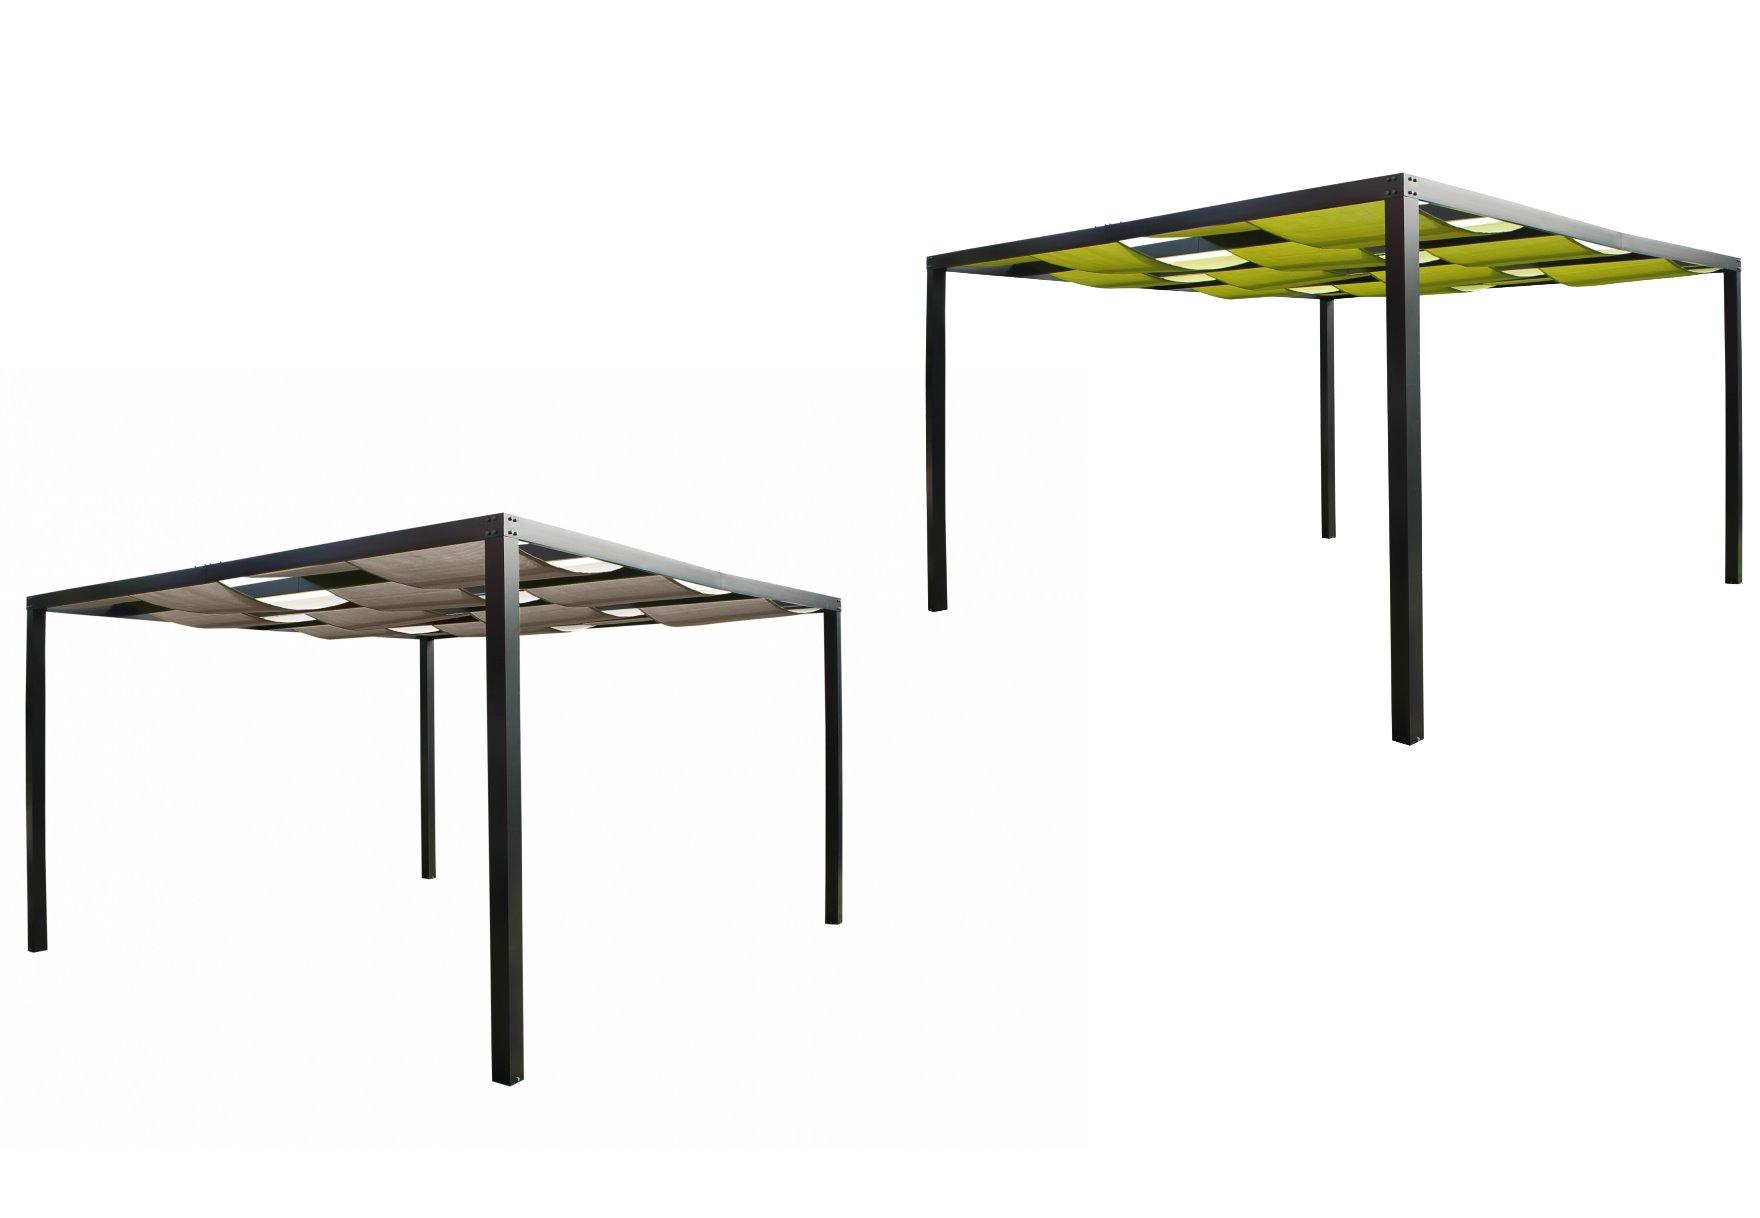 leco alu pergola loft 360x360cm terrasse berdachung. Black Bedroom Furniture Sets. Home Design Ideas